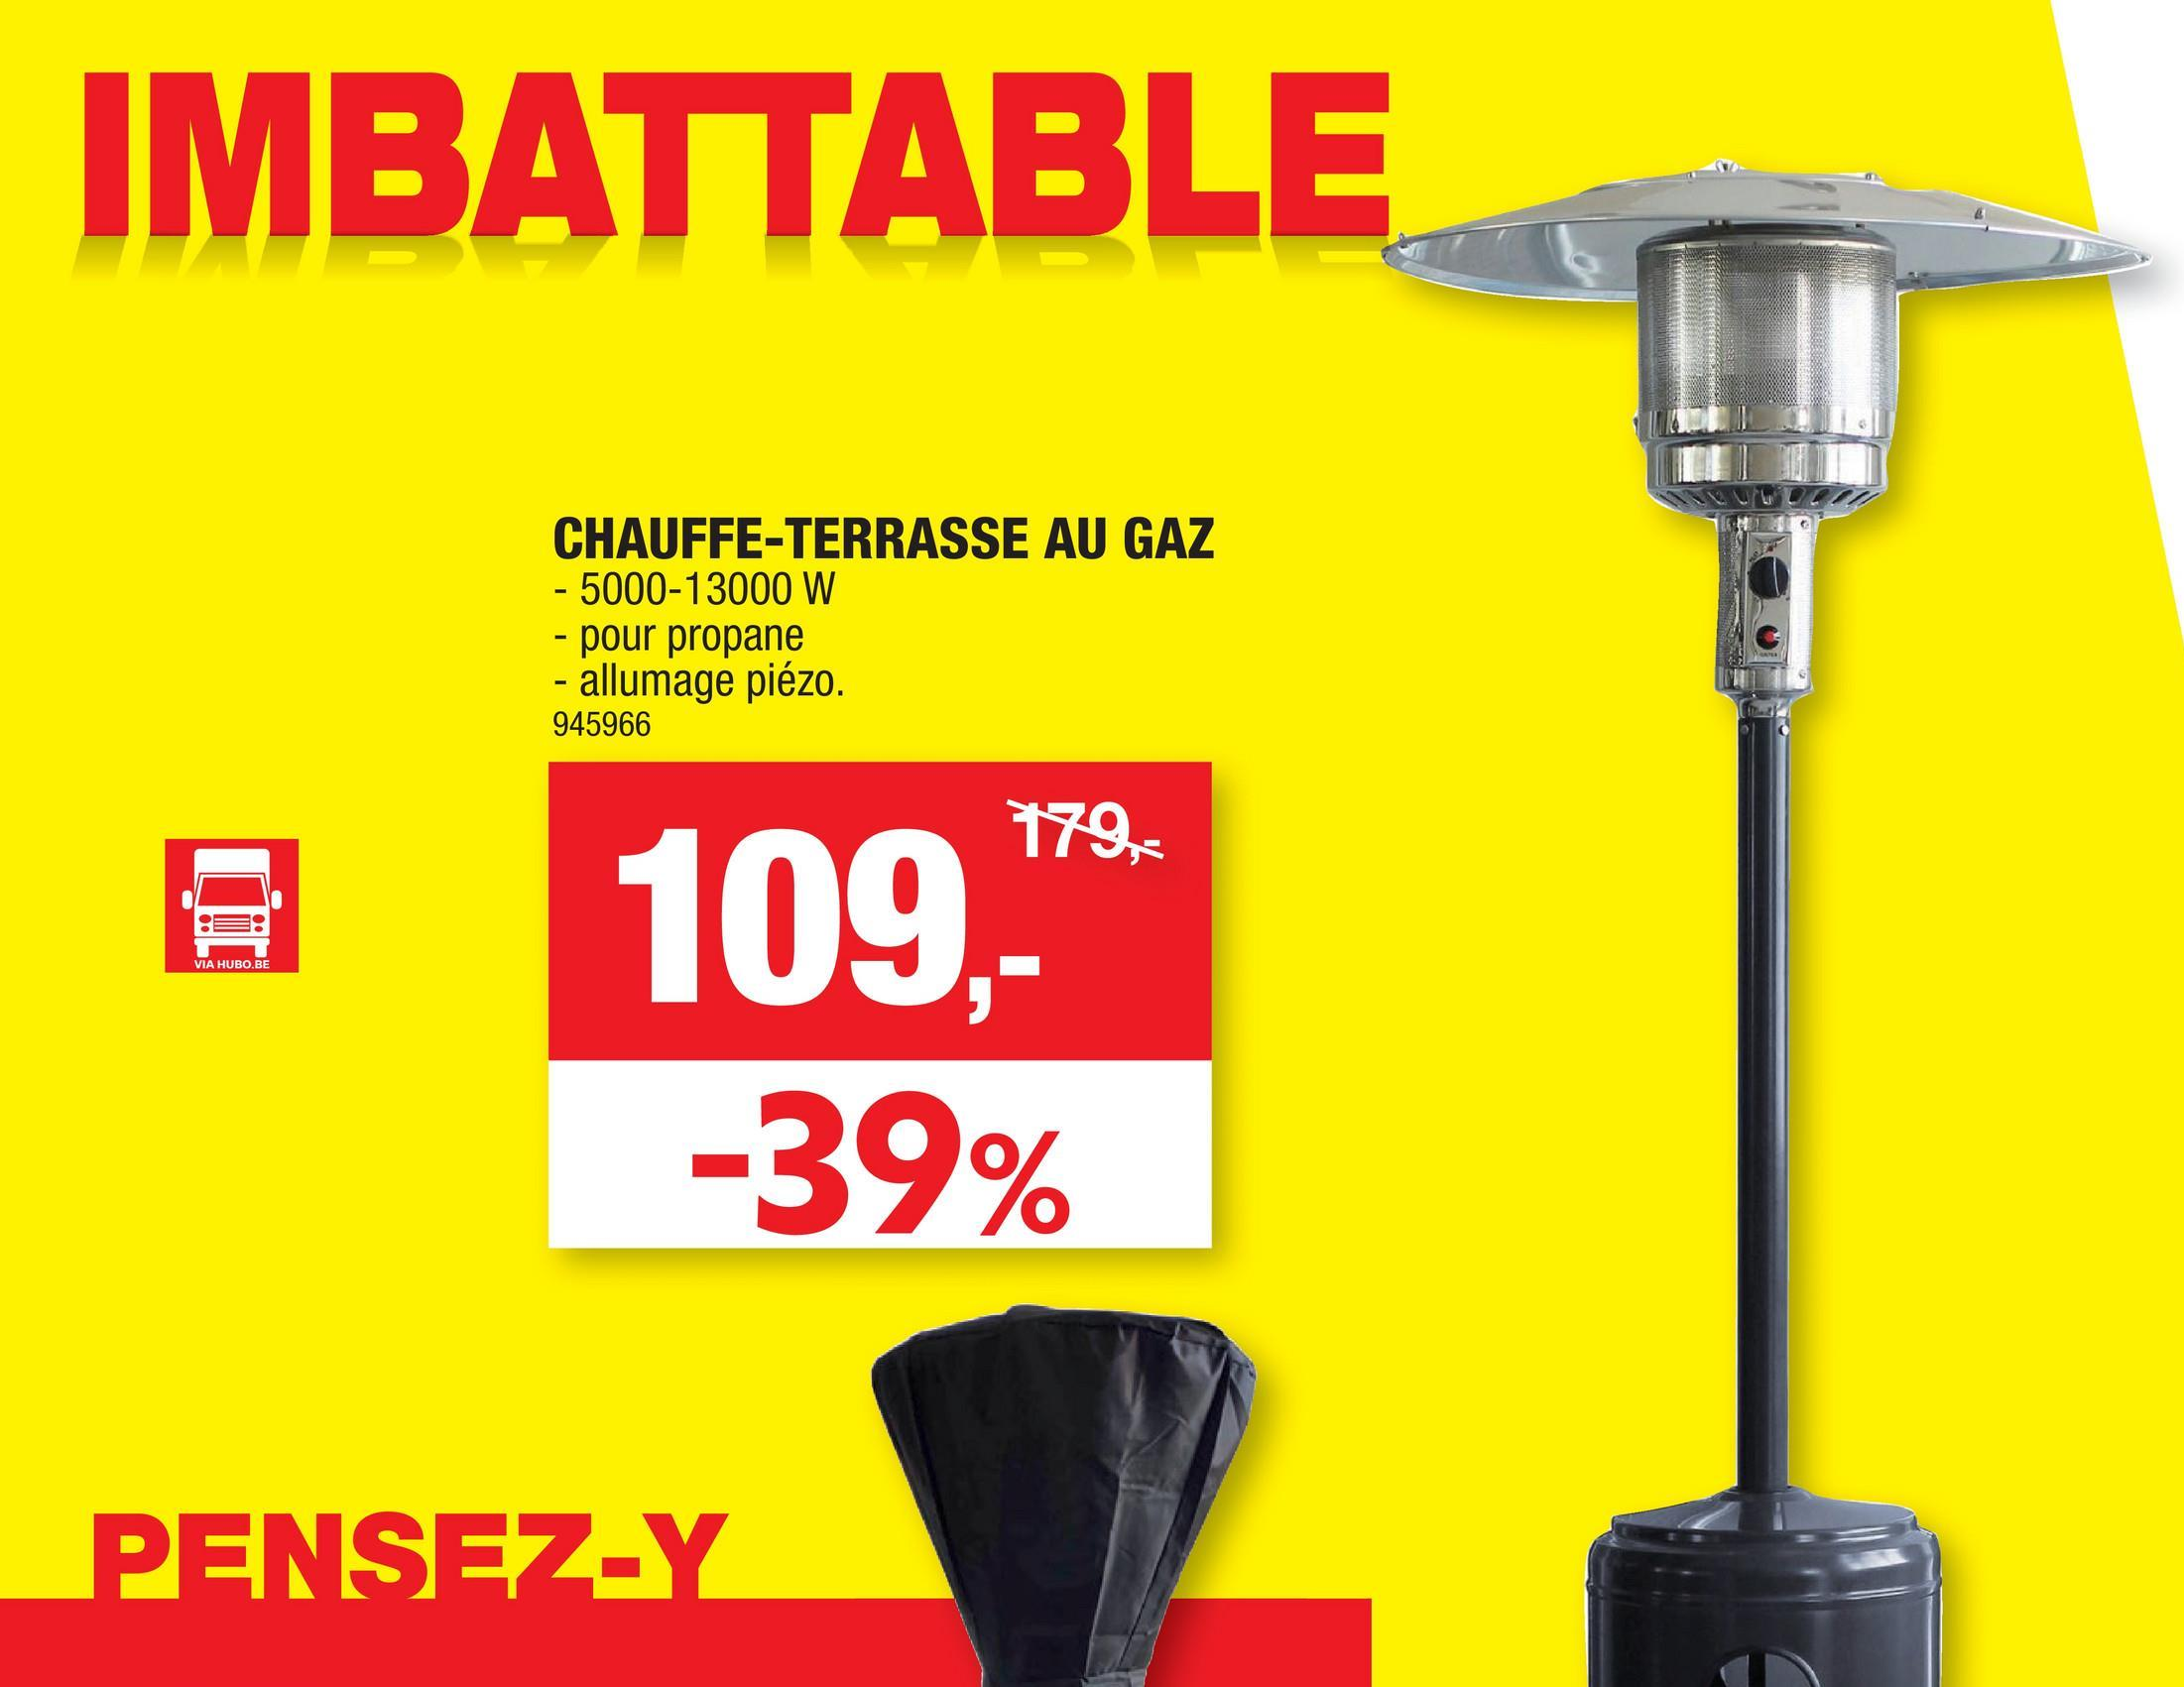 "IMBATTABLE CHAUFFE-TERRASSE AU GAZ - 5000-13000 W - pour propane - allumage piézo. 945966 179, 0 VIA HUBO.BE 109,"" -39% PENSEZ-Y"